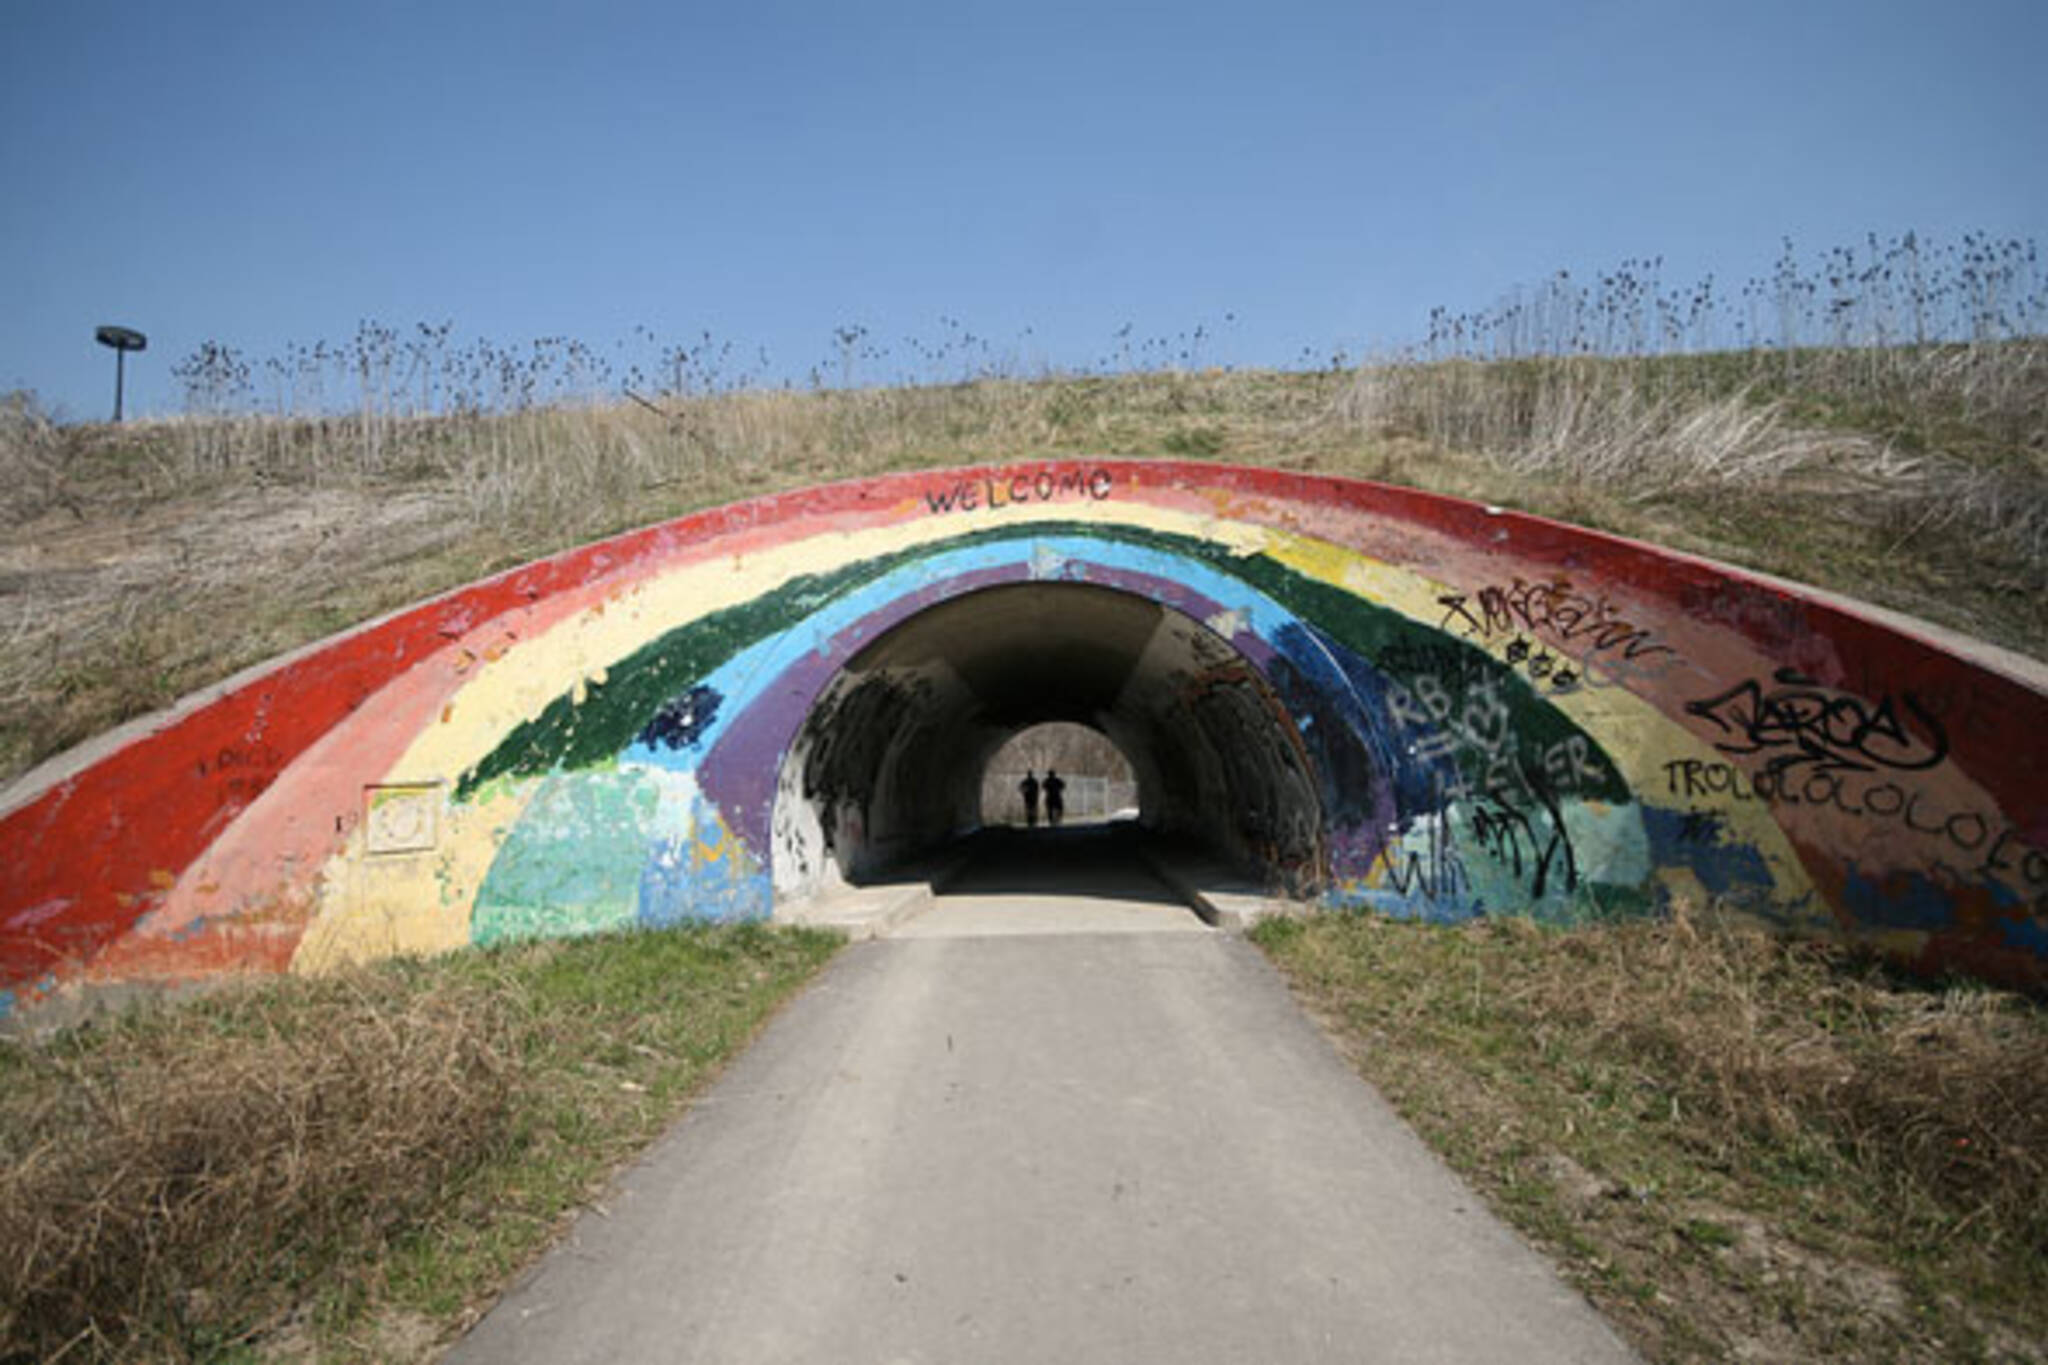 toronto don valley rainbow